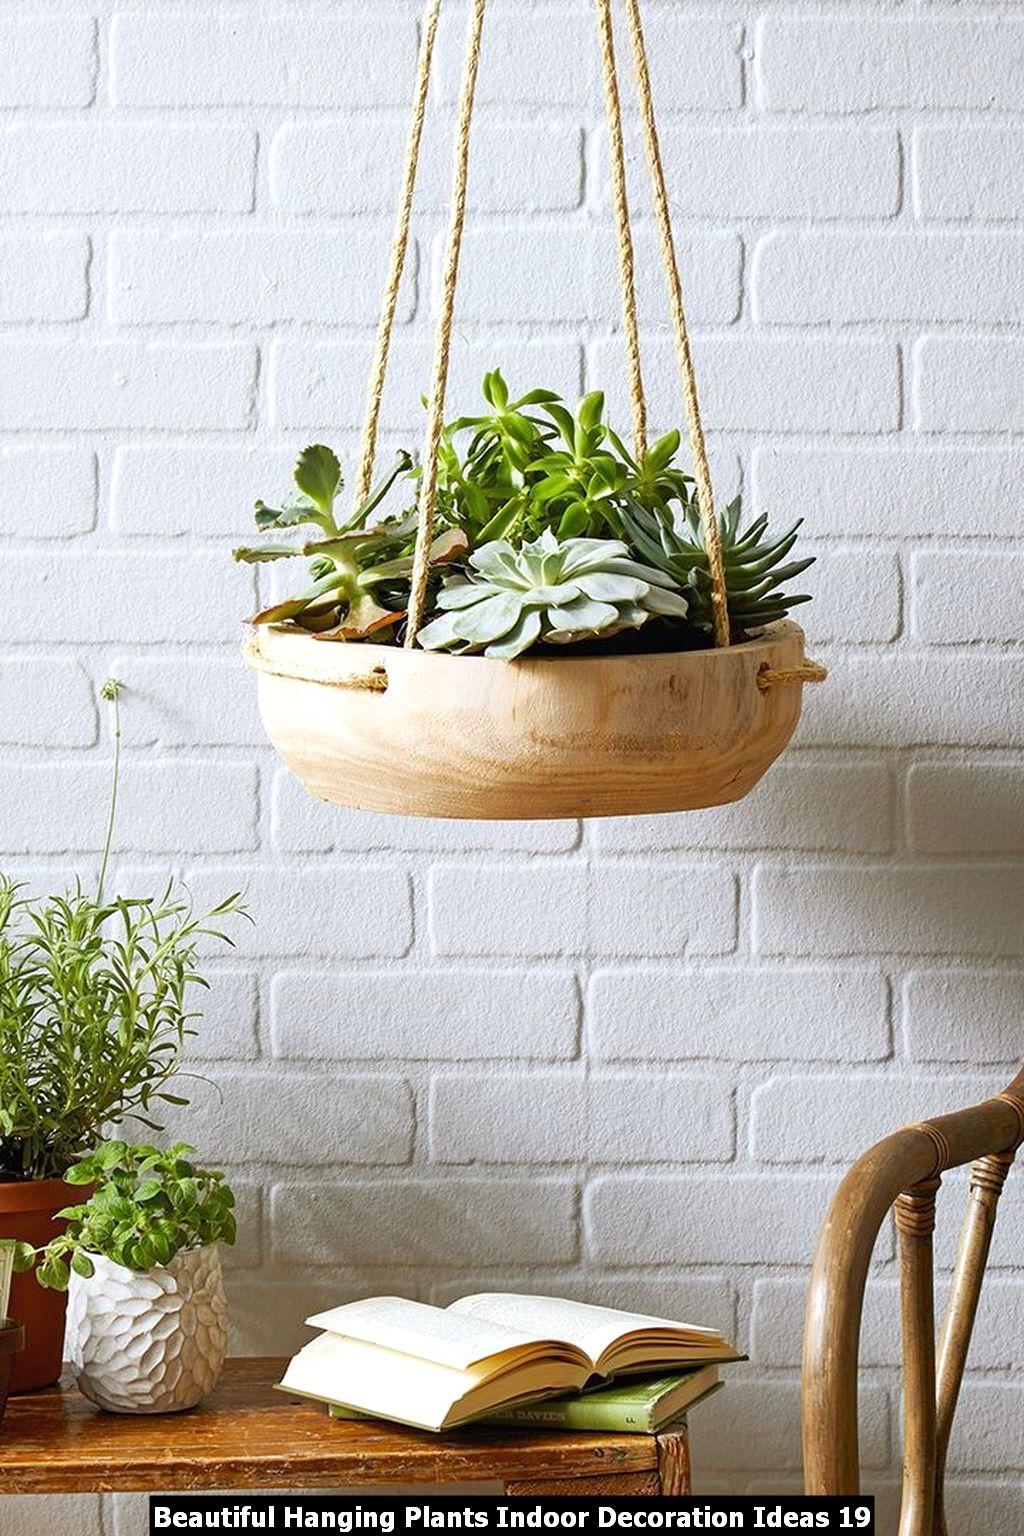 Beautiful Hanging Plants Indoor Decoration Ideas 19